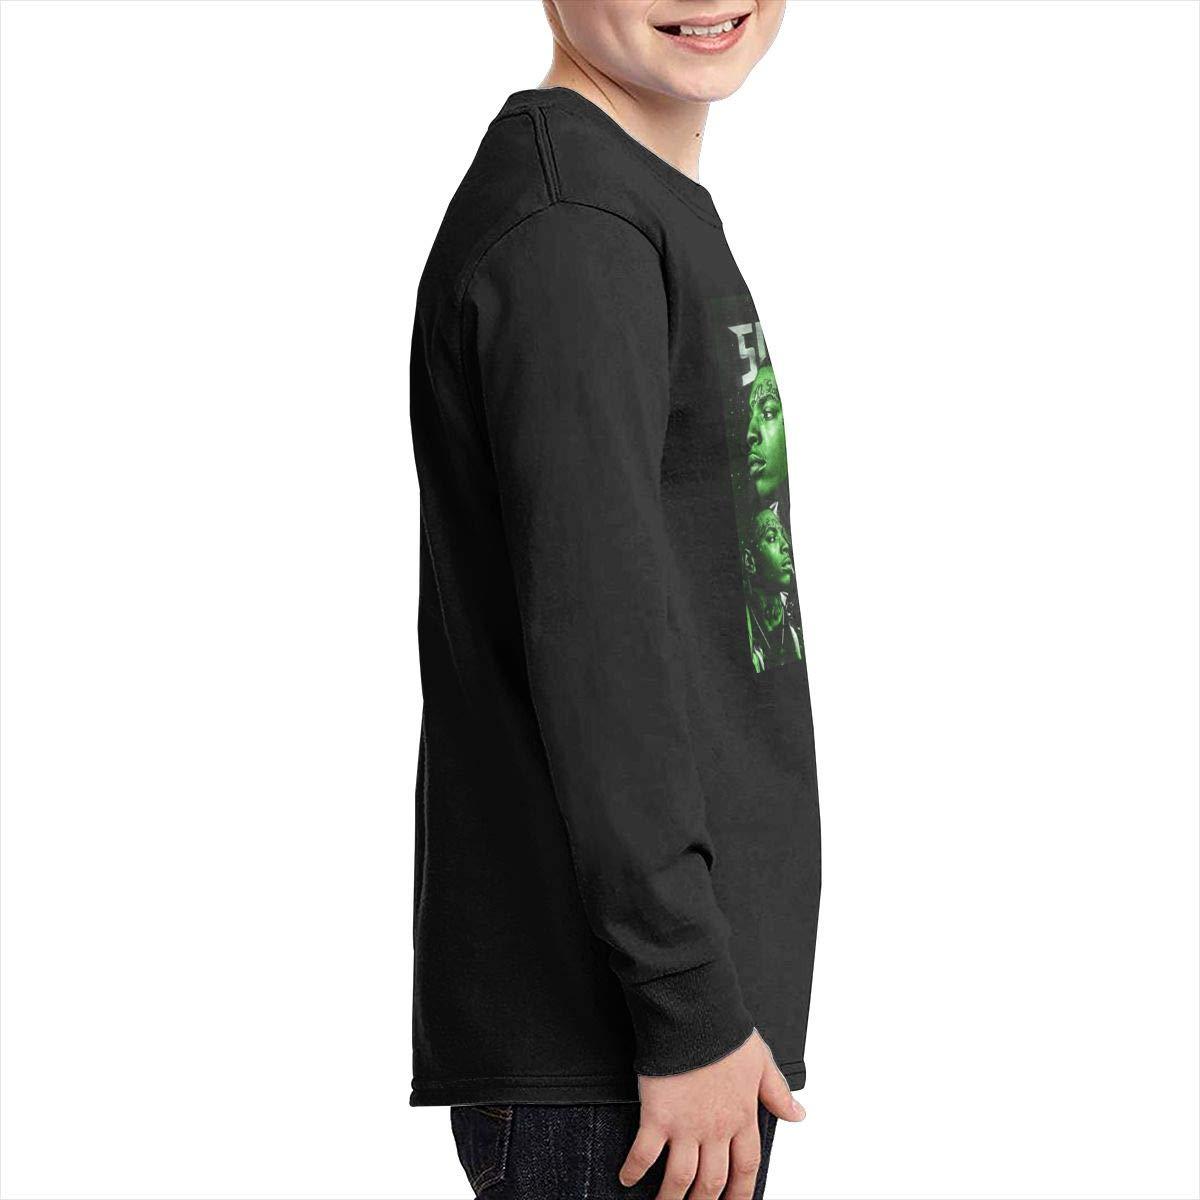 TWOSKILL Youth Crying-Gunna Long Sleeves Shirt Boys Girls